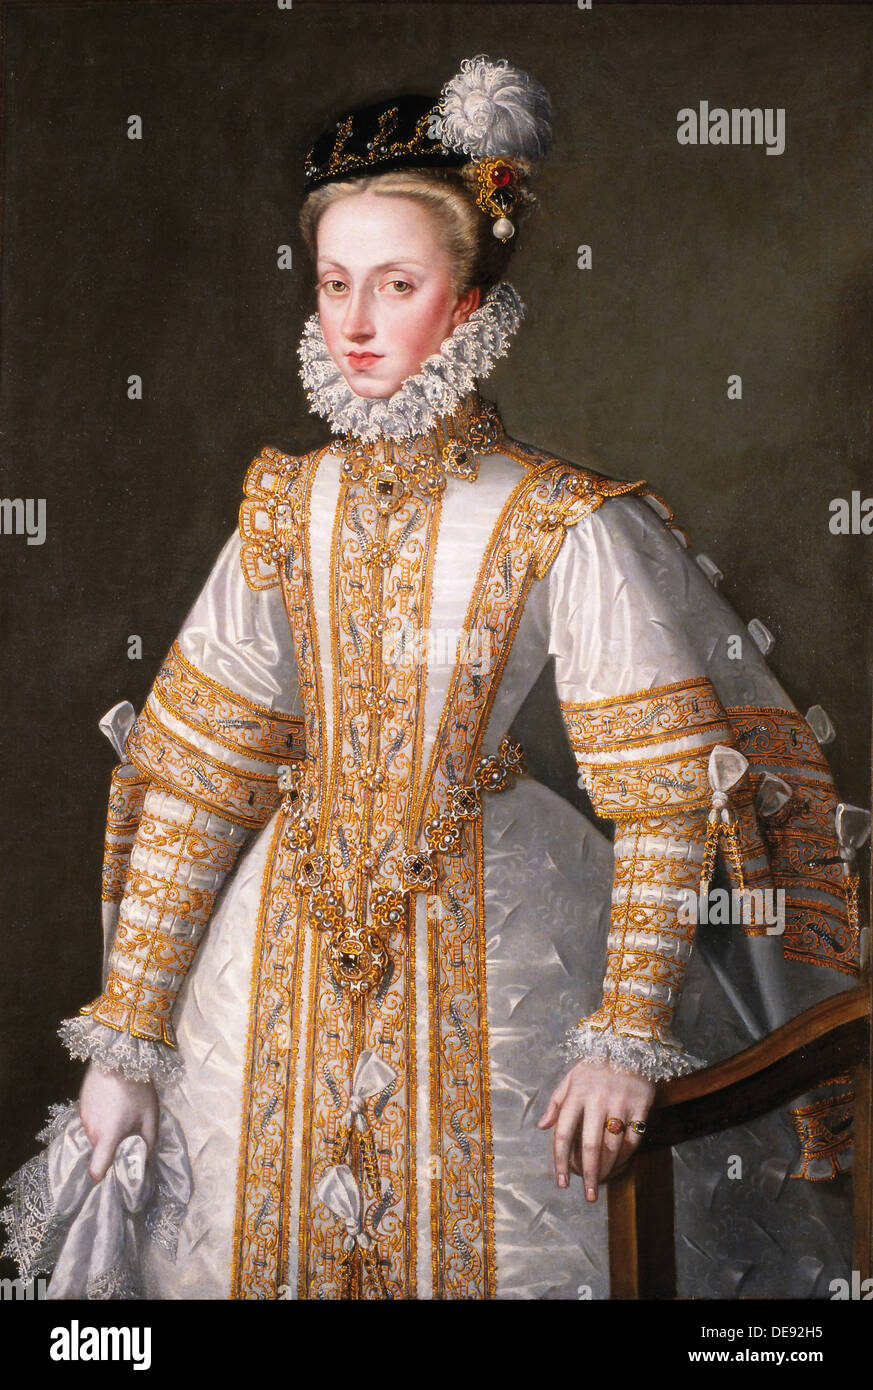 Portrait of Anna of Austria (1549–1580), Queen consort of Spain, 1571. Artist: Coello, Alonso Sánchez (1531-1588) - Stock Image